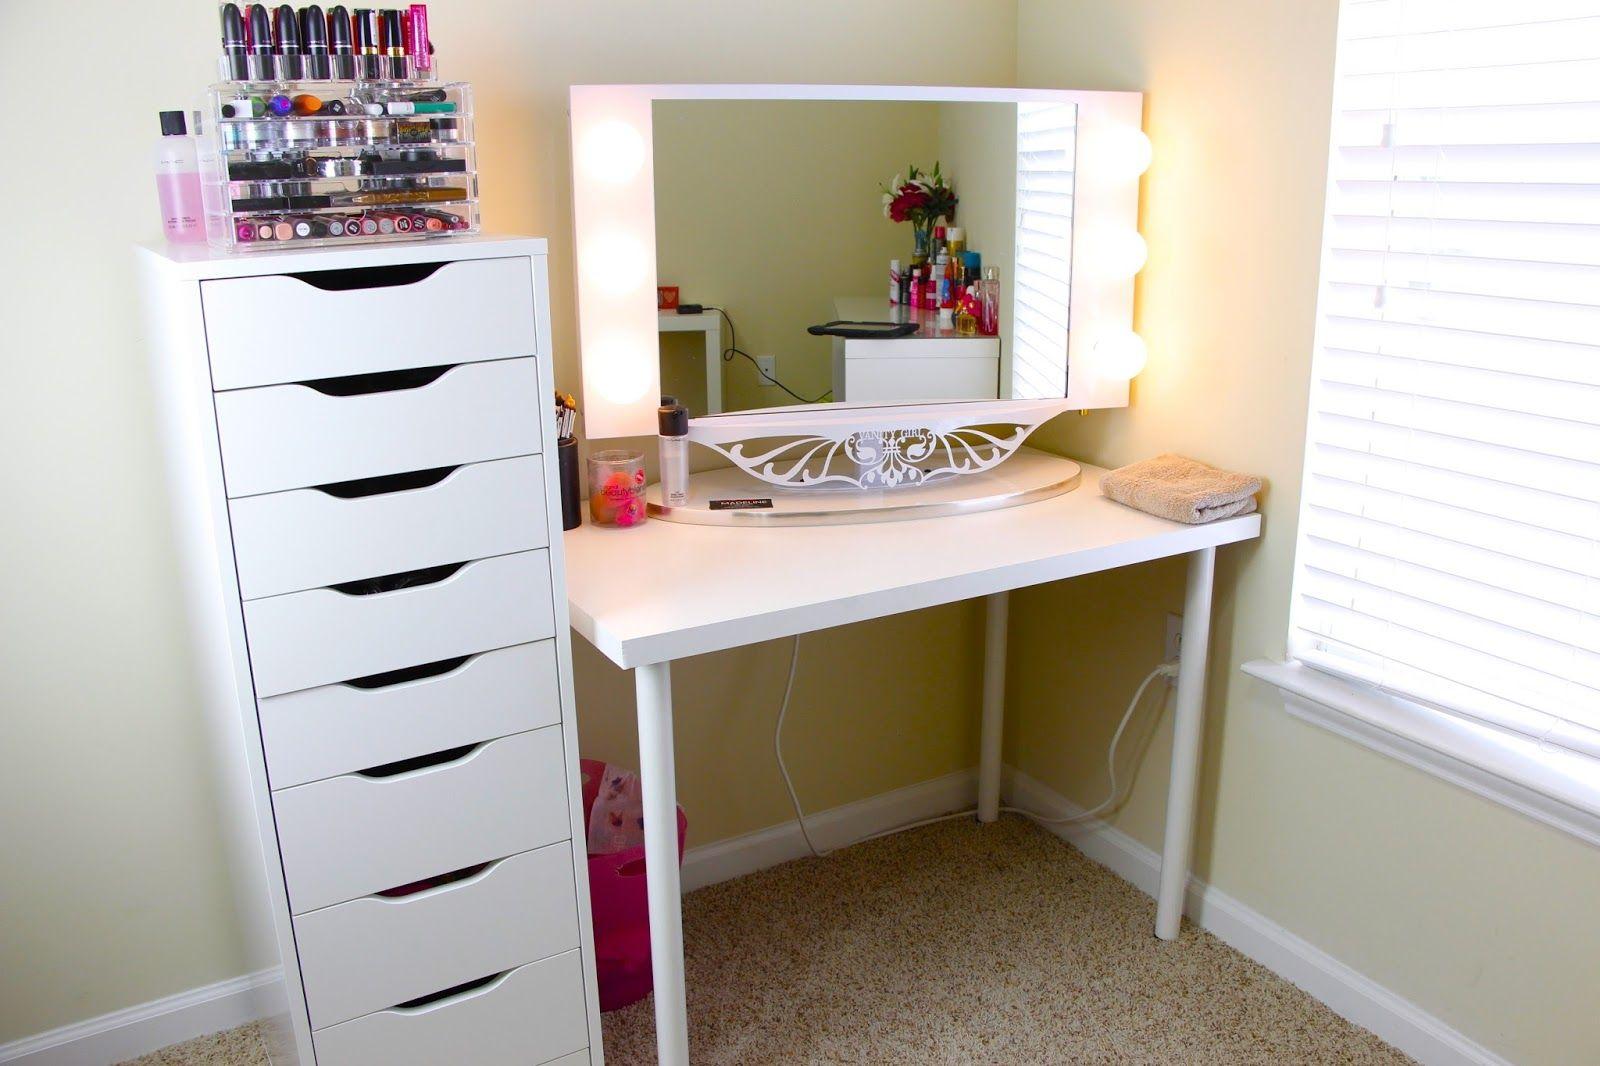 Best Images About Makeup Room  On Pinterest Drawer Unit - Makeup vanity ideas